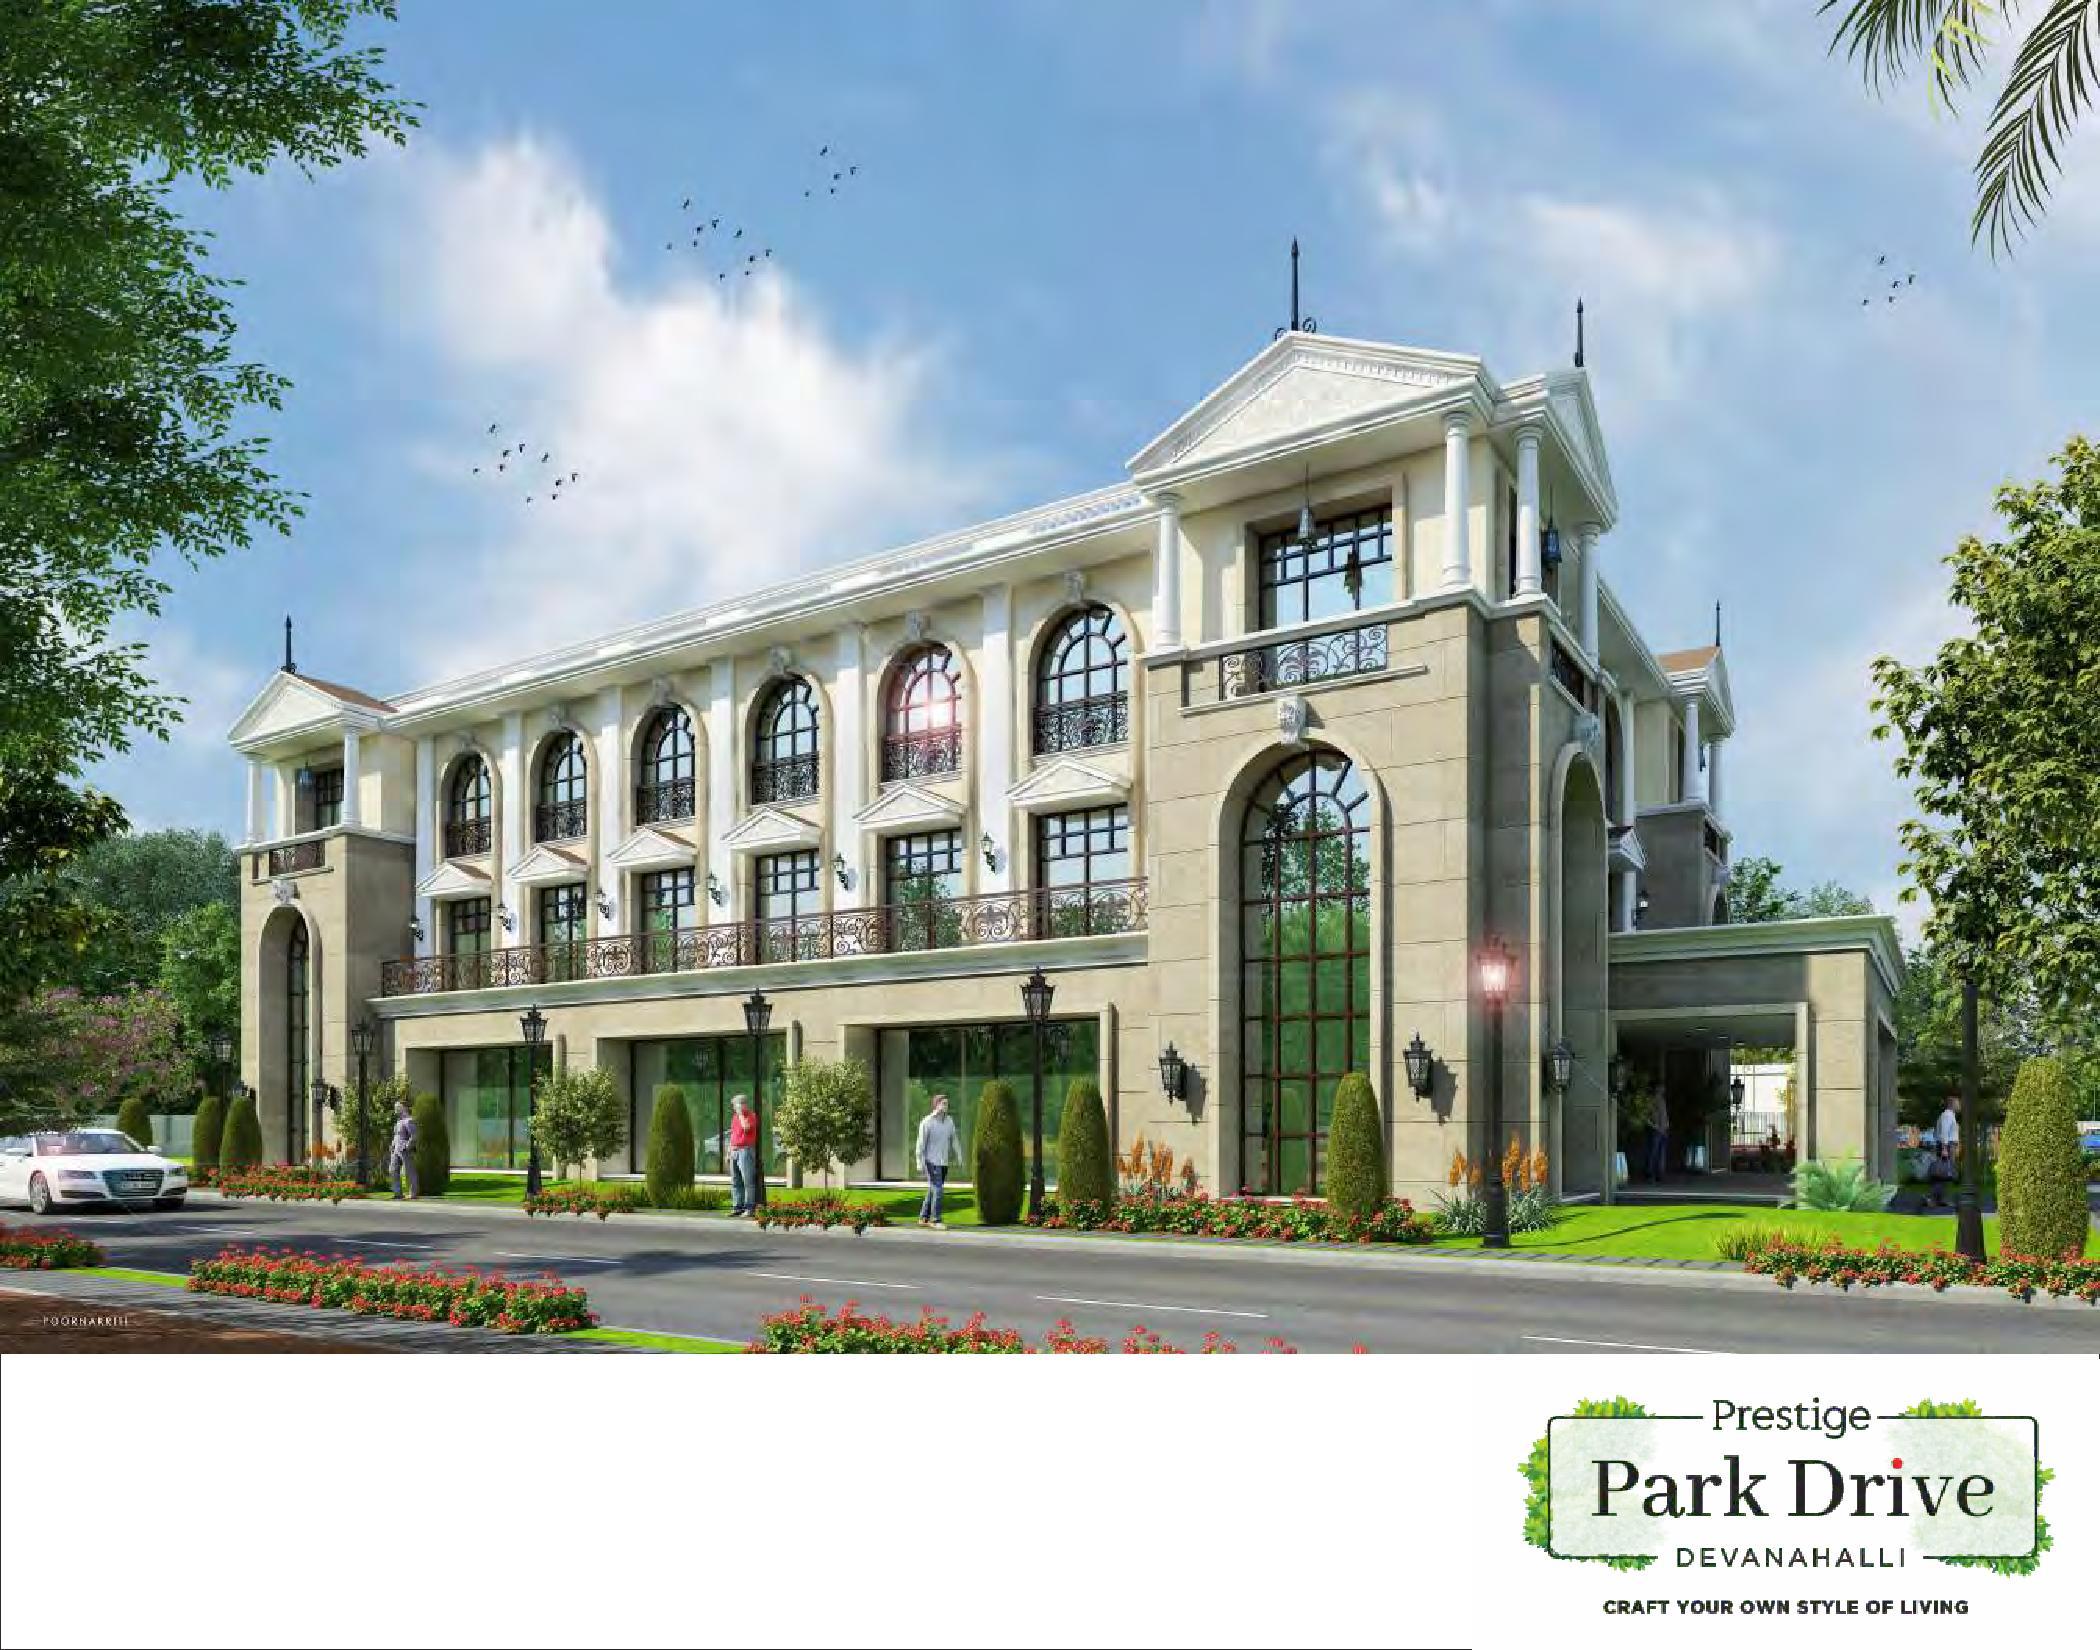 Prestige-Park-Drive-Plot-in-Devanahalli-Bangalore-Image-04